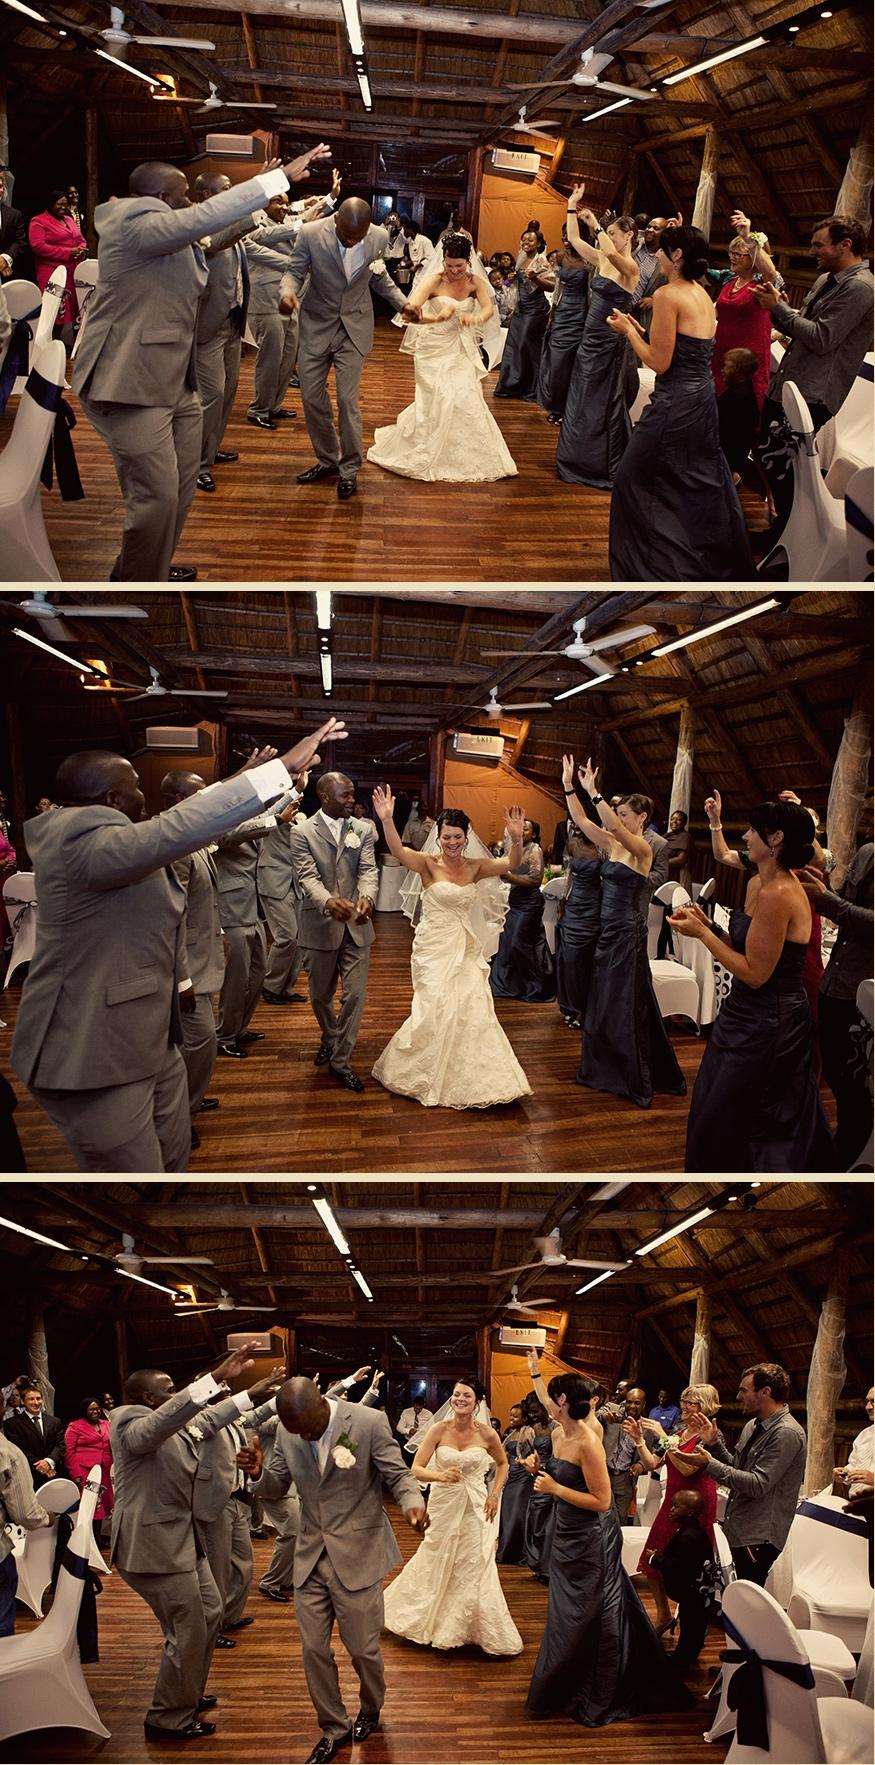 Brisbane Wedding Phoographer Blog-collage-1329191426208